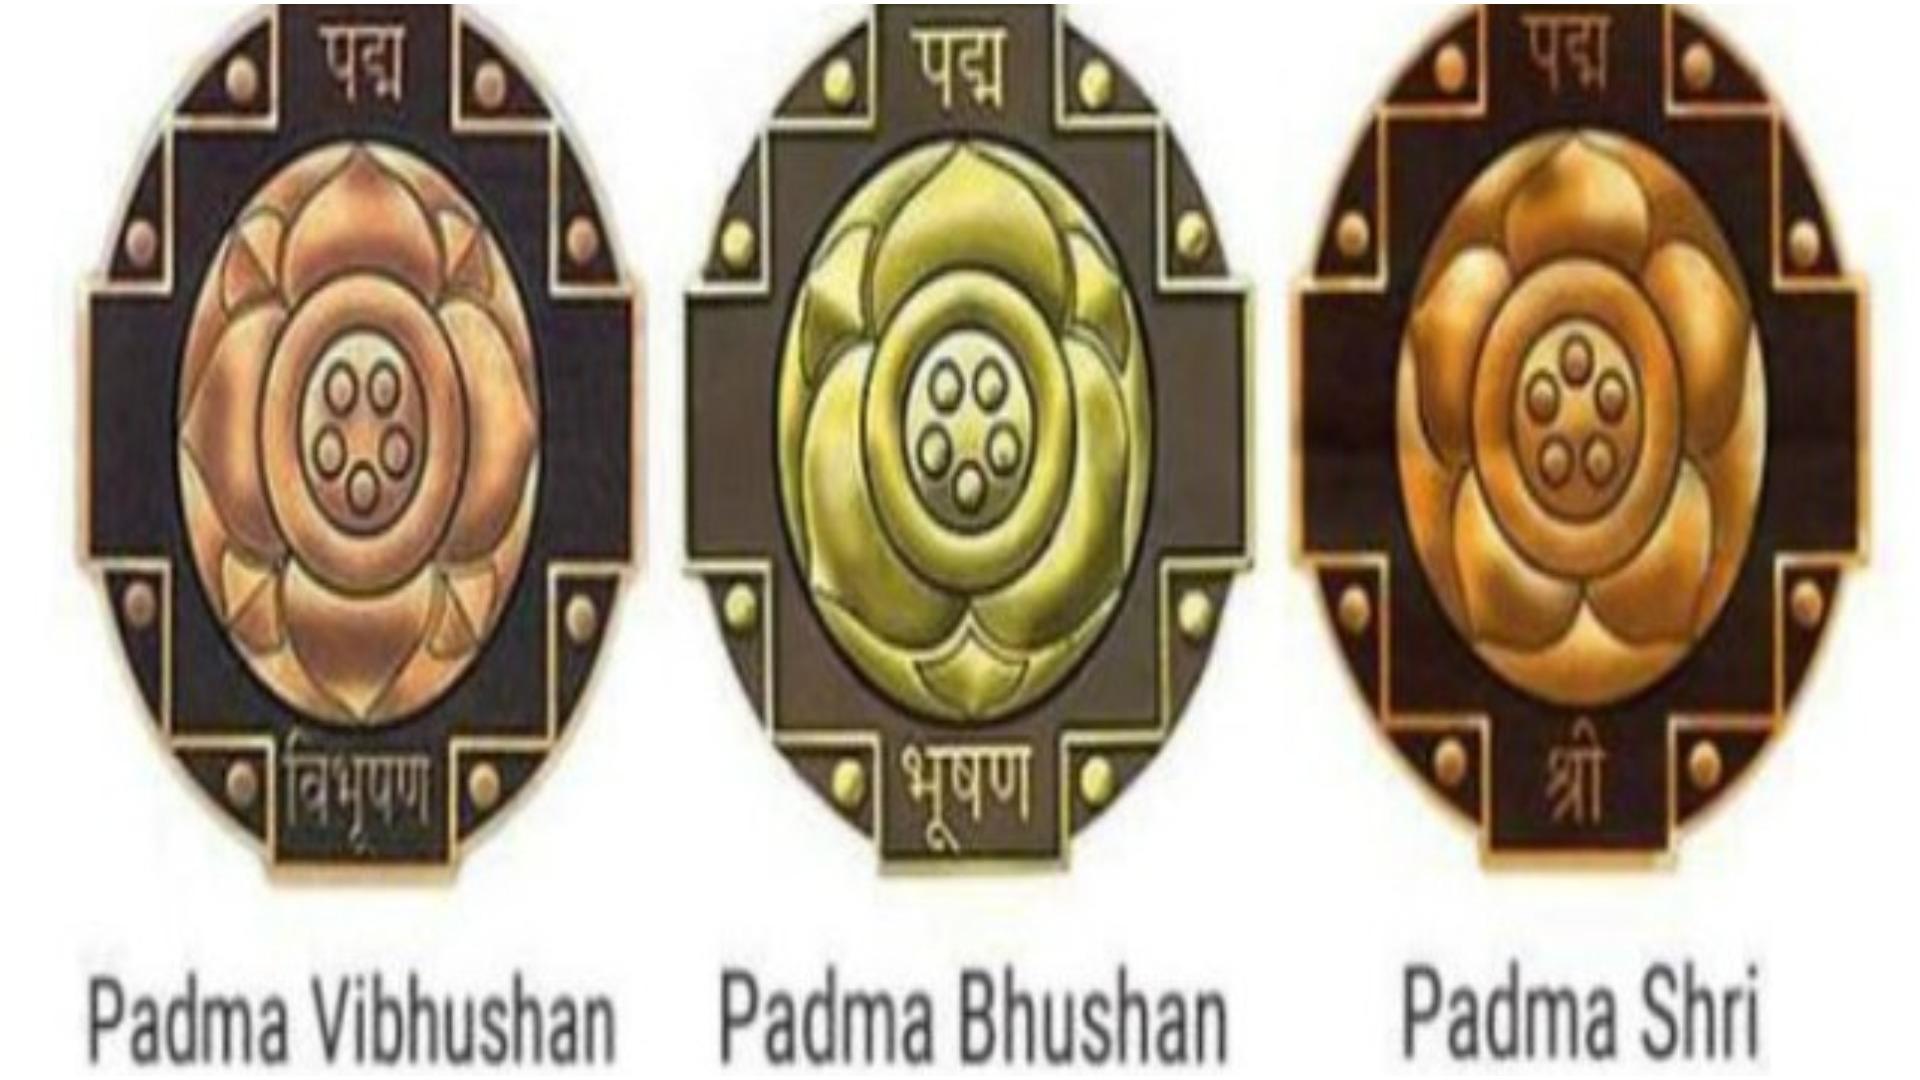 कादर खान, मनोज बाजपेयी, प्रभुदेवा और शंकर महादेवन को पद्मश्री पुरस्कार, देखिए पूरी लिस्ट